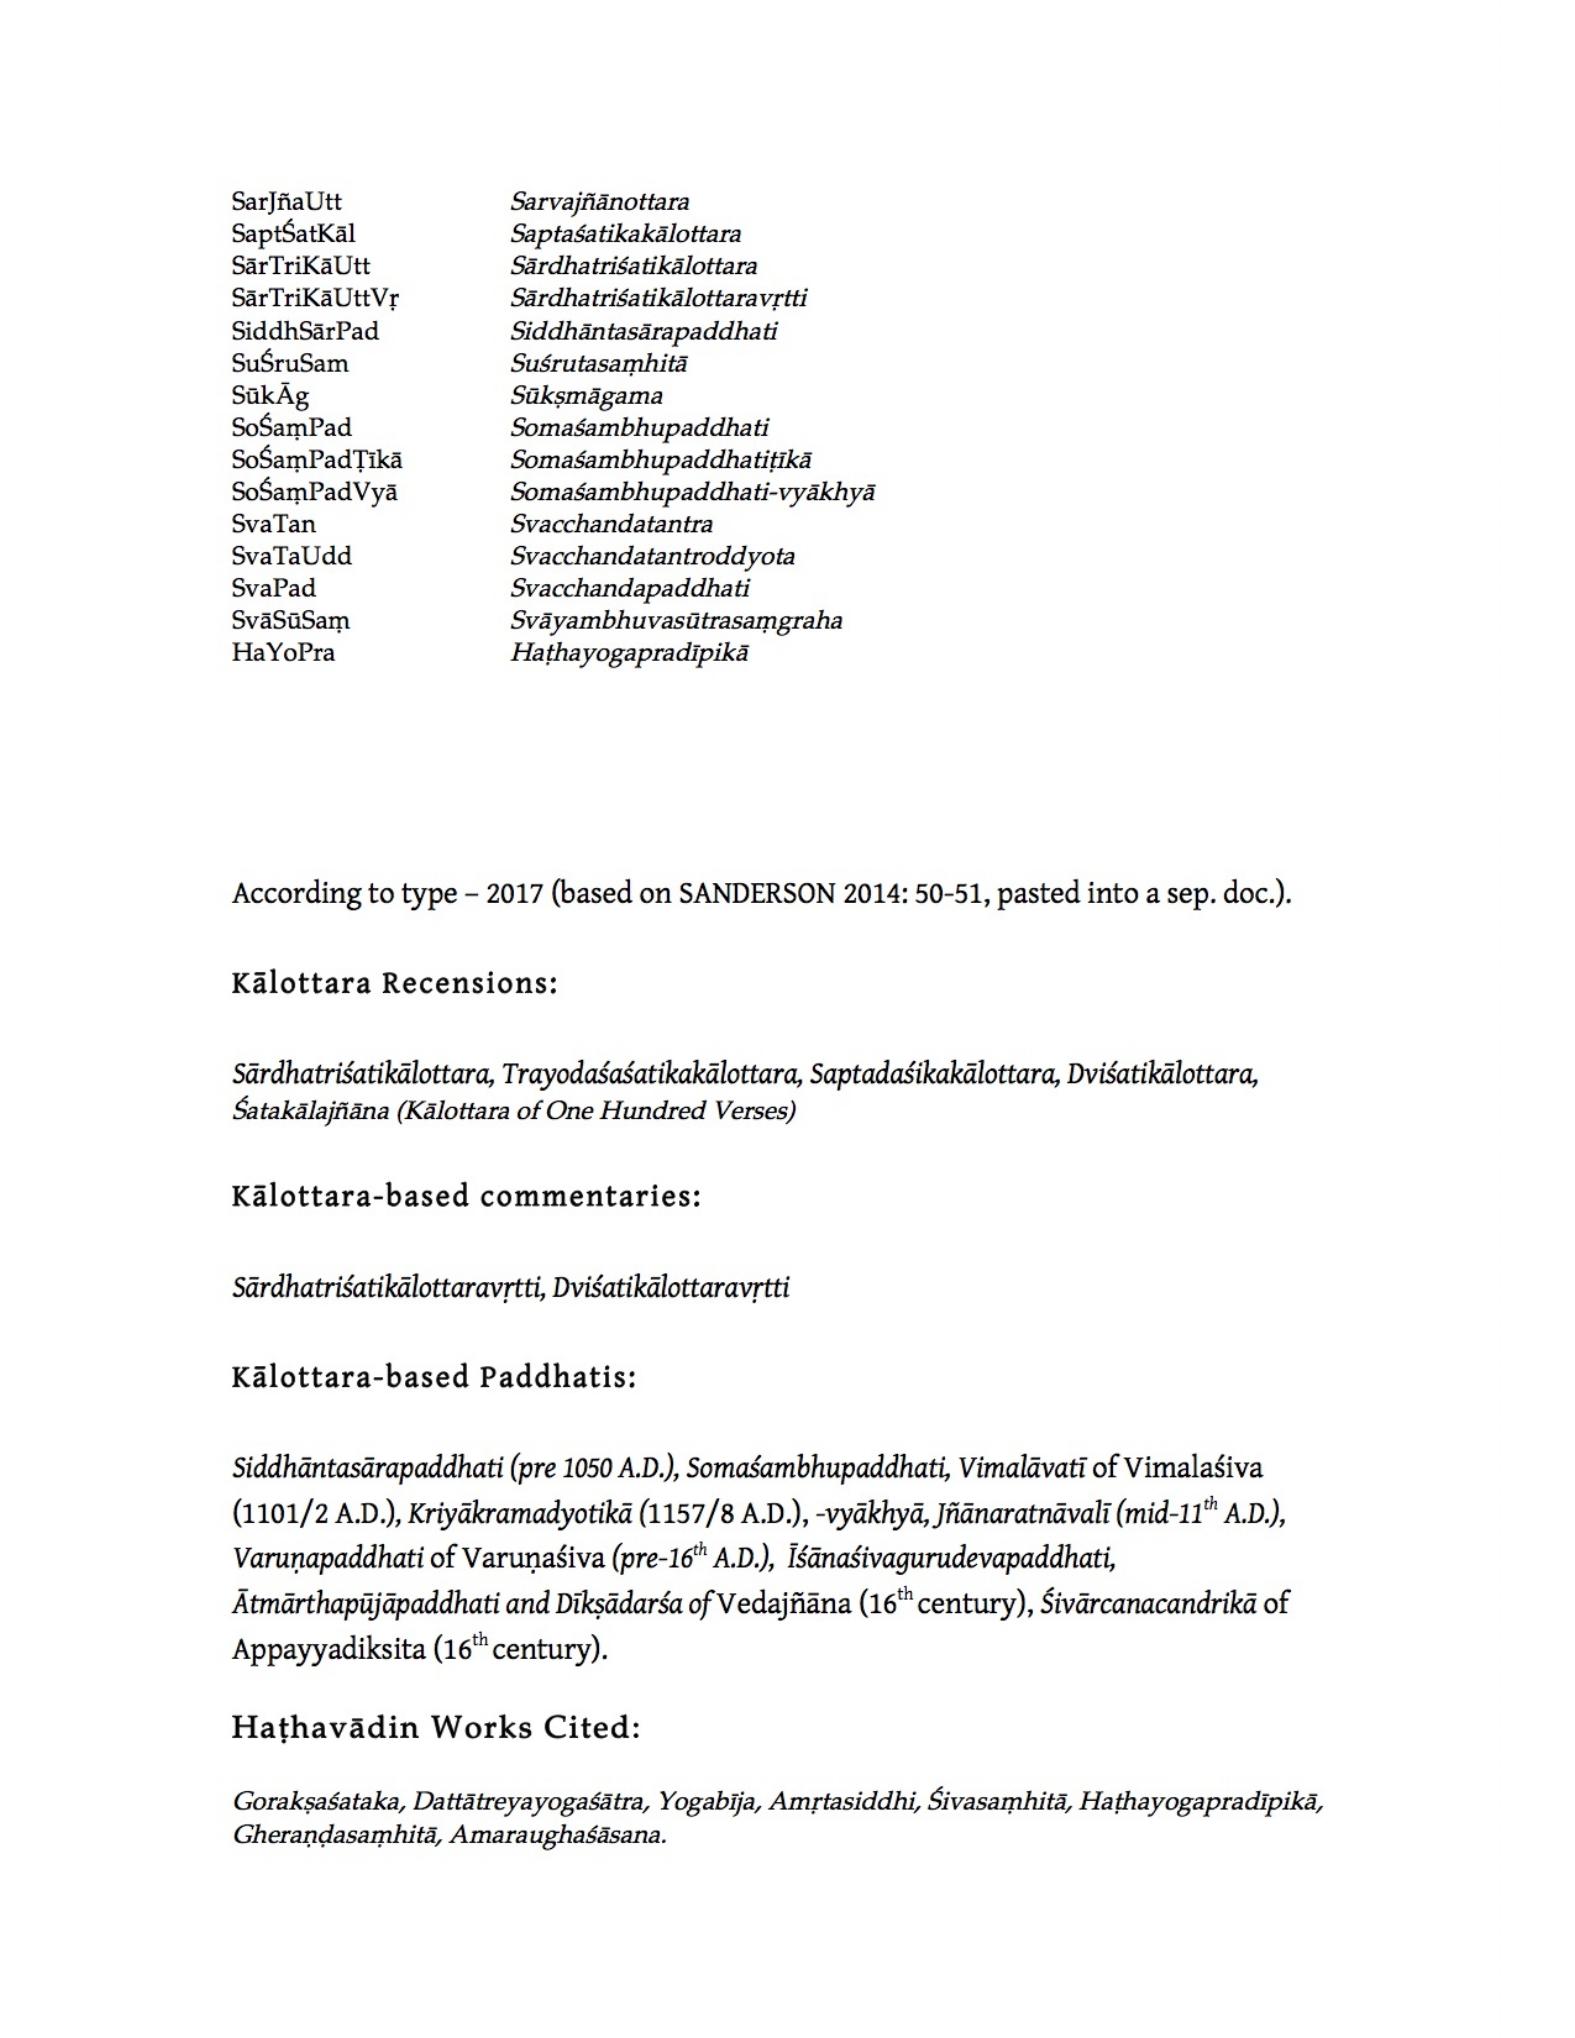 primary Sanskrit sources page 2.jpg